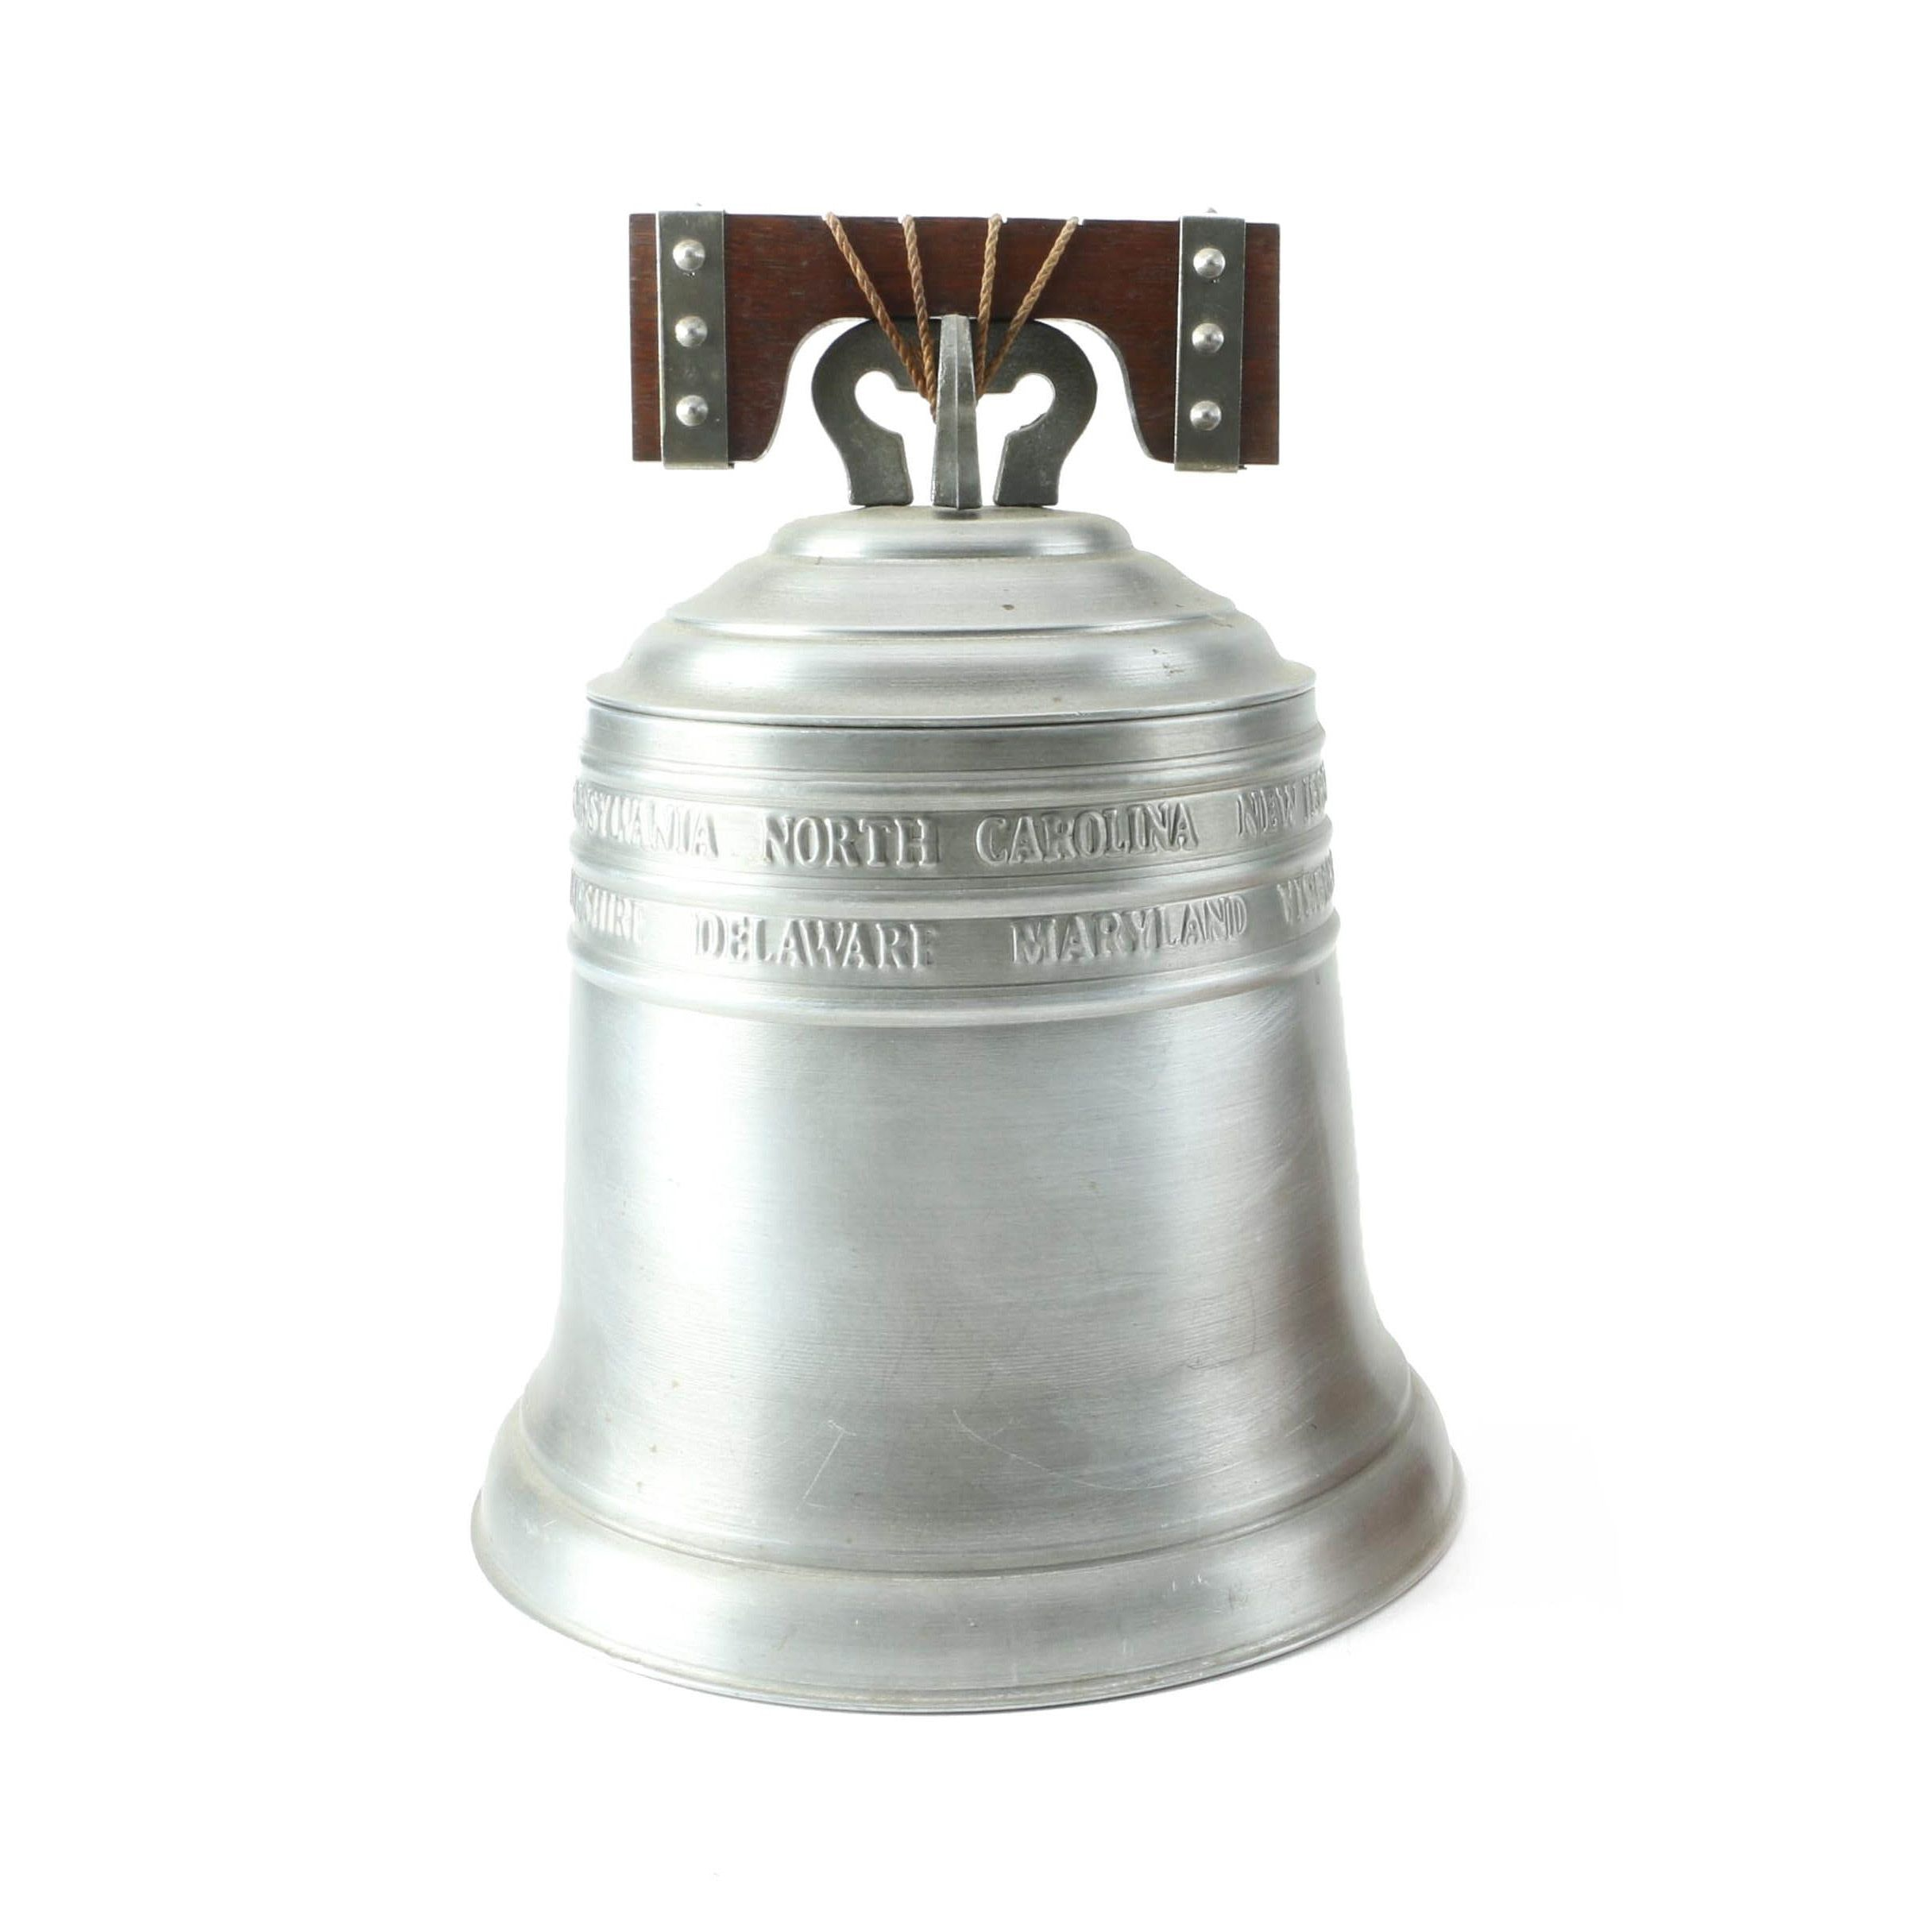 1974 Pewtertone Liberty Bell Ice Bucket